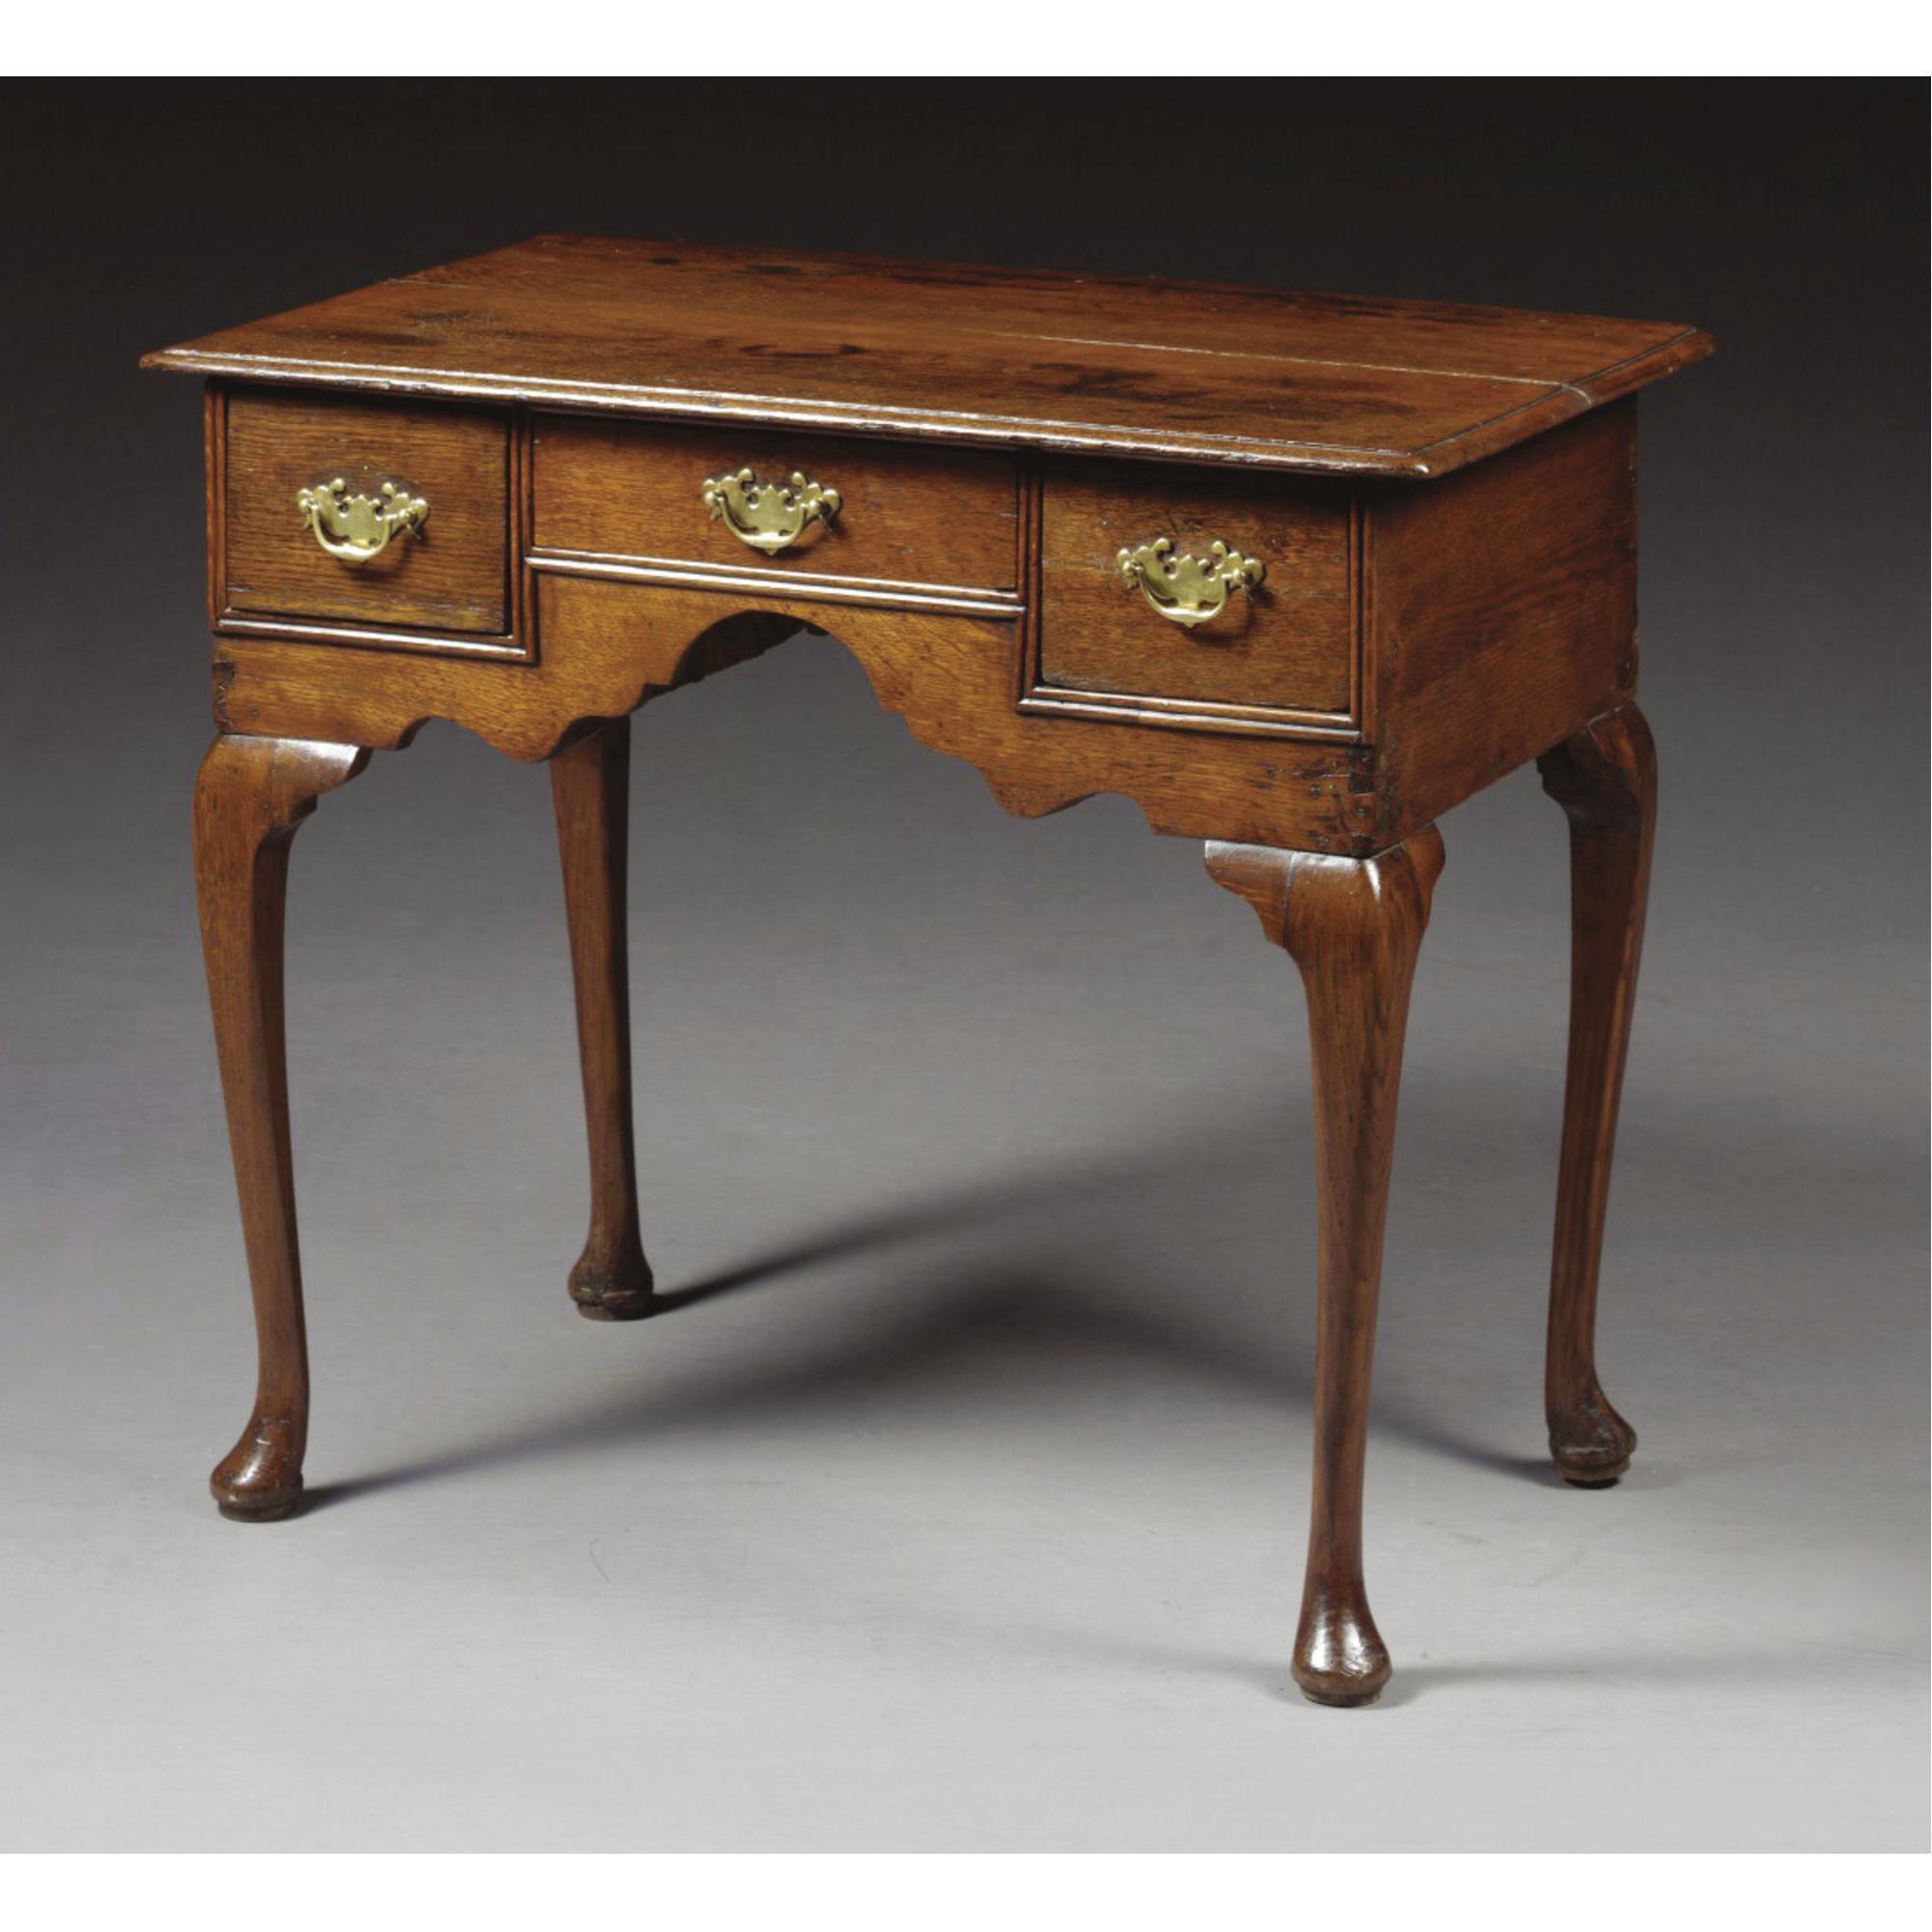 Una mesa auxiliar de roble estilo reina ana a principios - Muebles siglo xviii ...